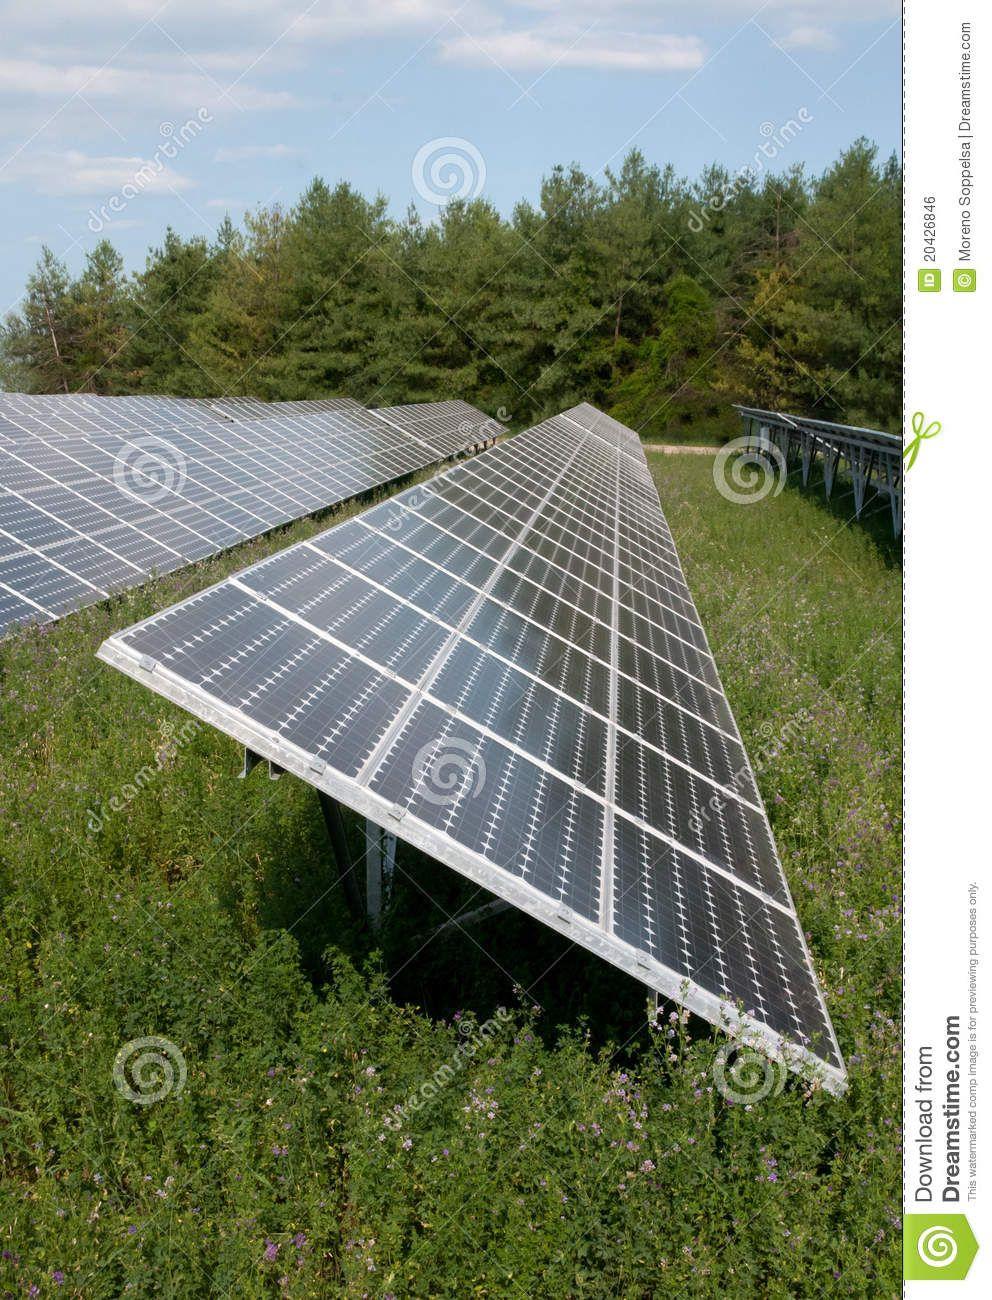 Energy Solar Panels Of A Highway Italian A Solar Panel Photovoltaic Solar Solar Renewable Electricity